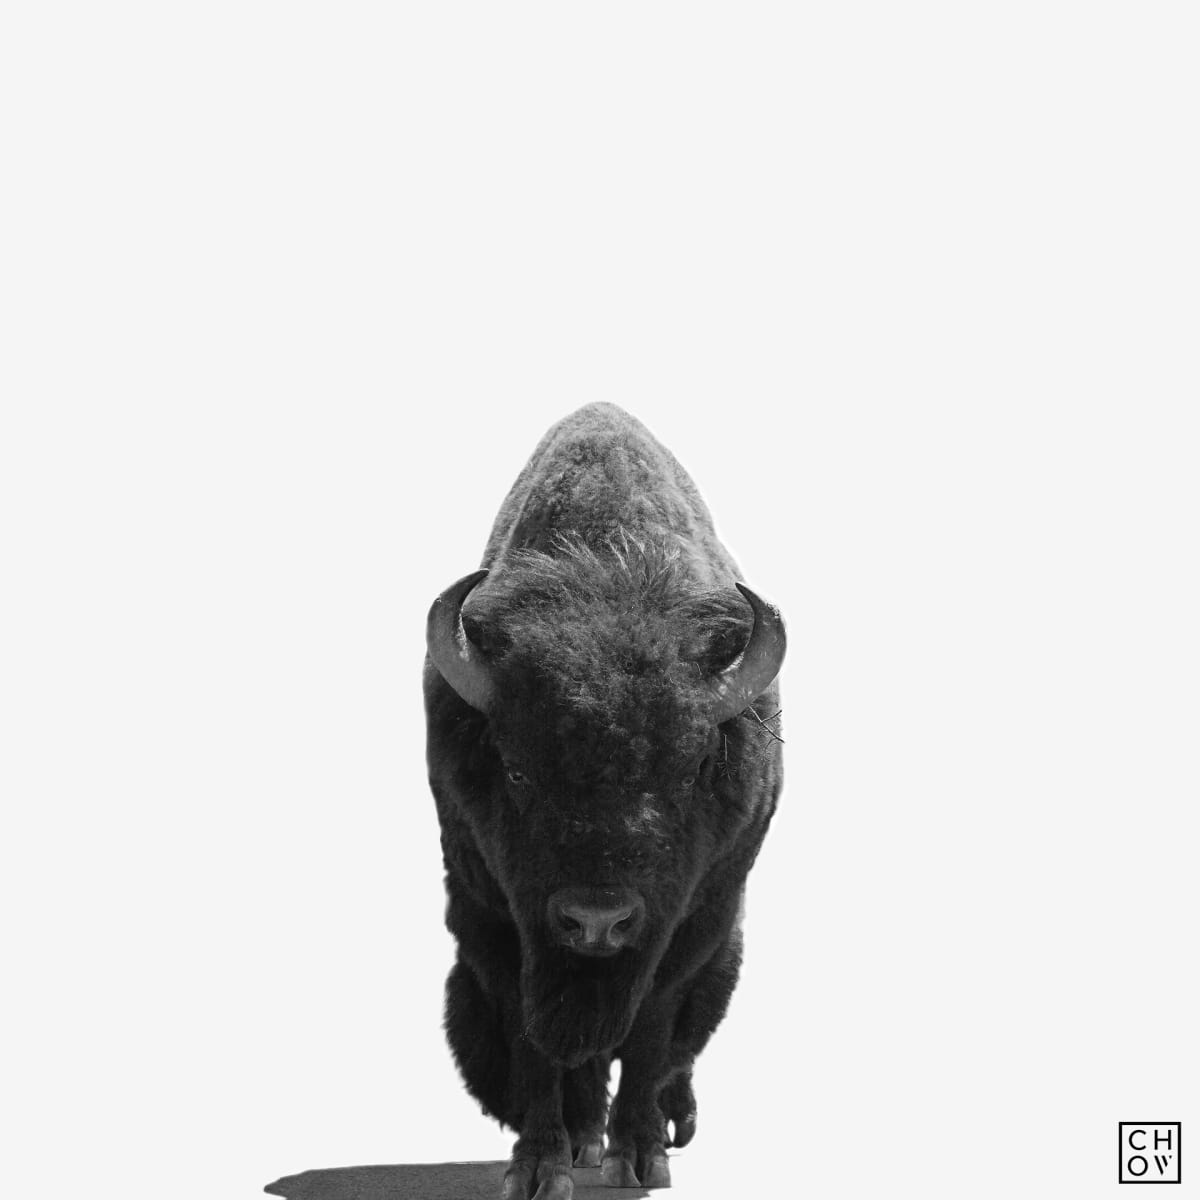 Austin Chow, American Bison // Yellowstone, 2017